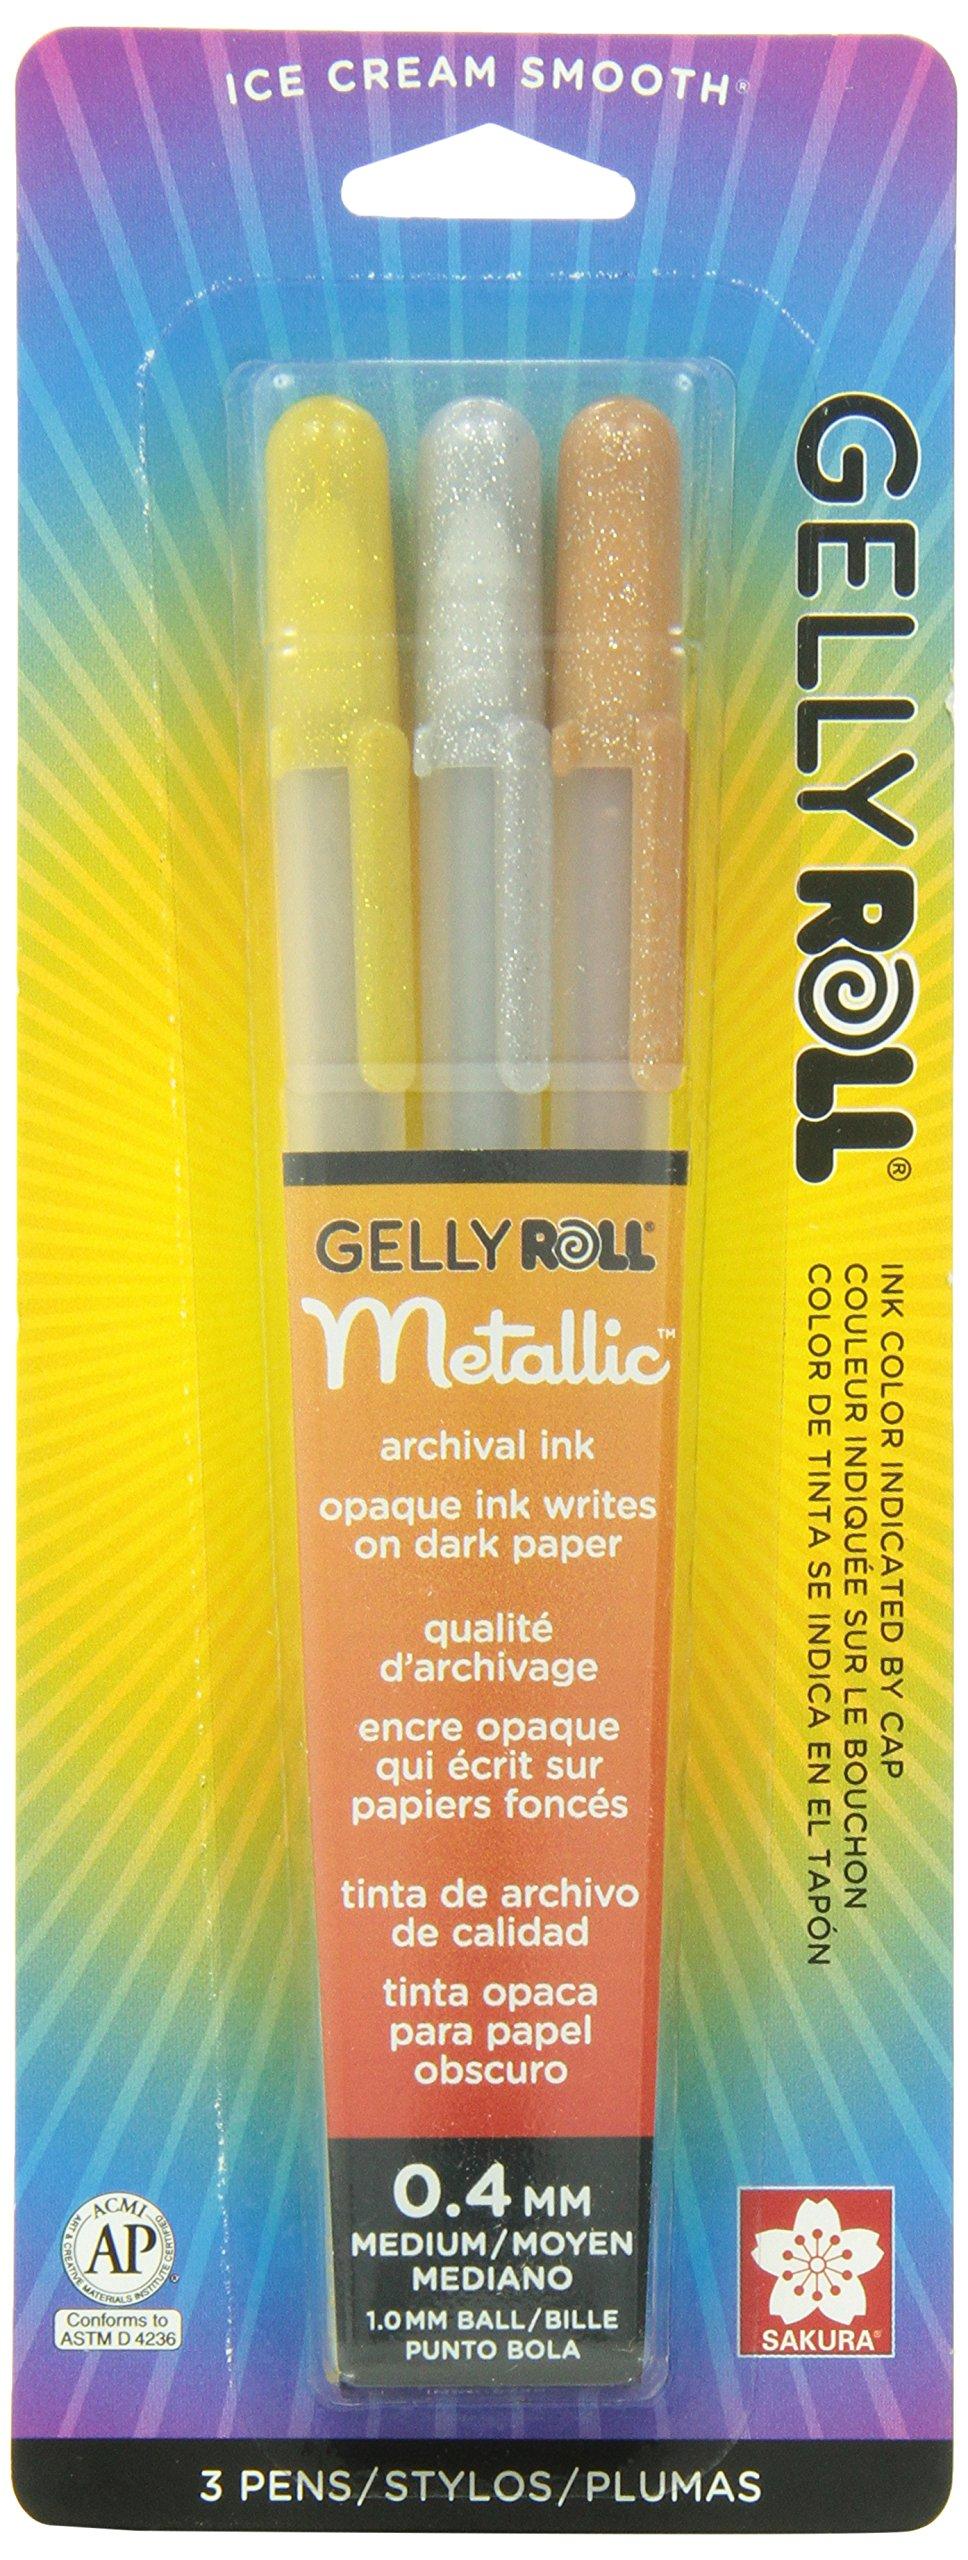 Sakura 57387 3-Piece Gelly Roll Blister Card Metallic Gel Ink Pen Set, Assorted Colors